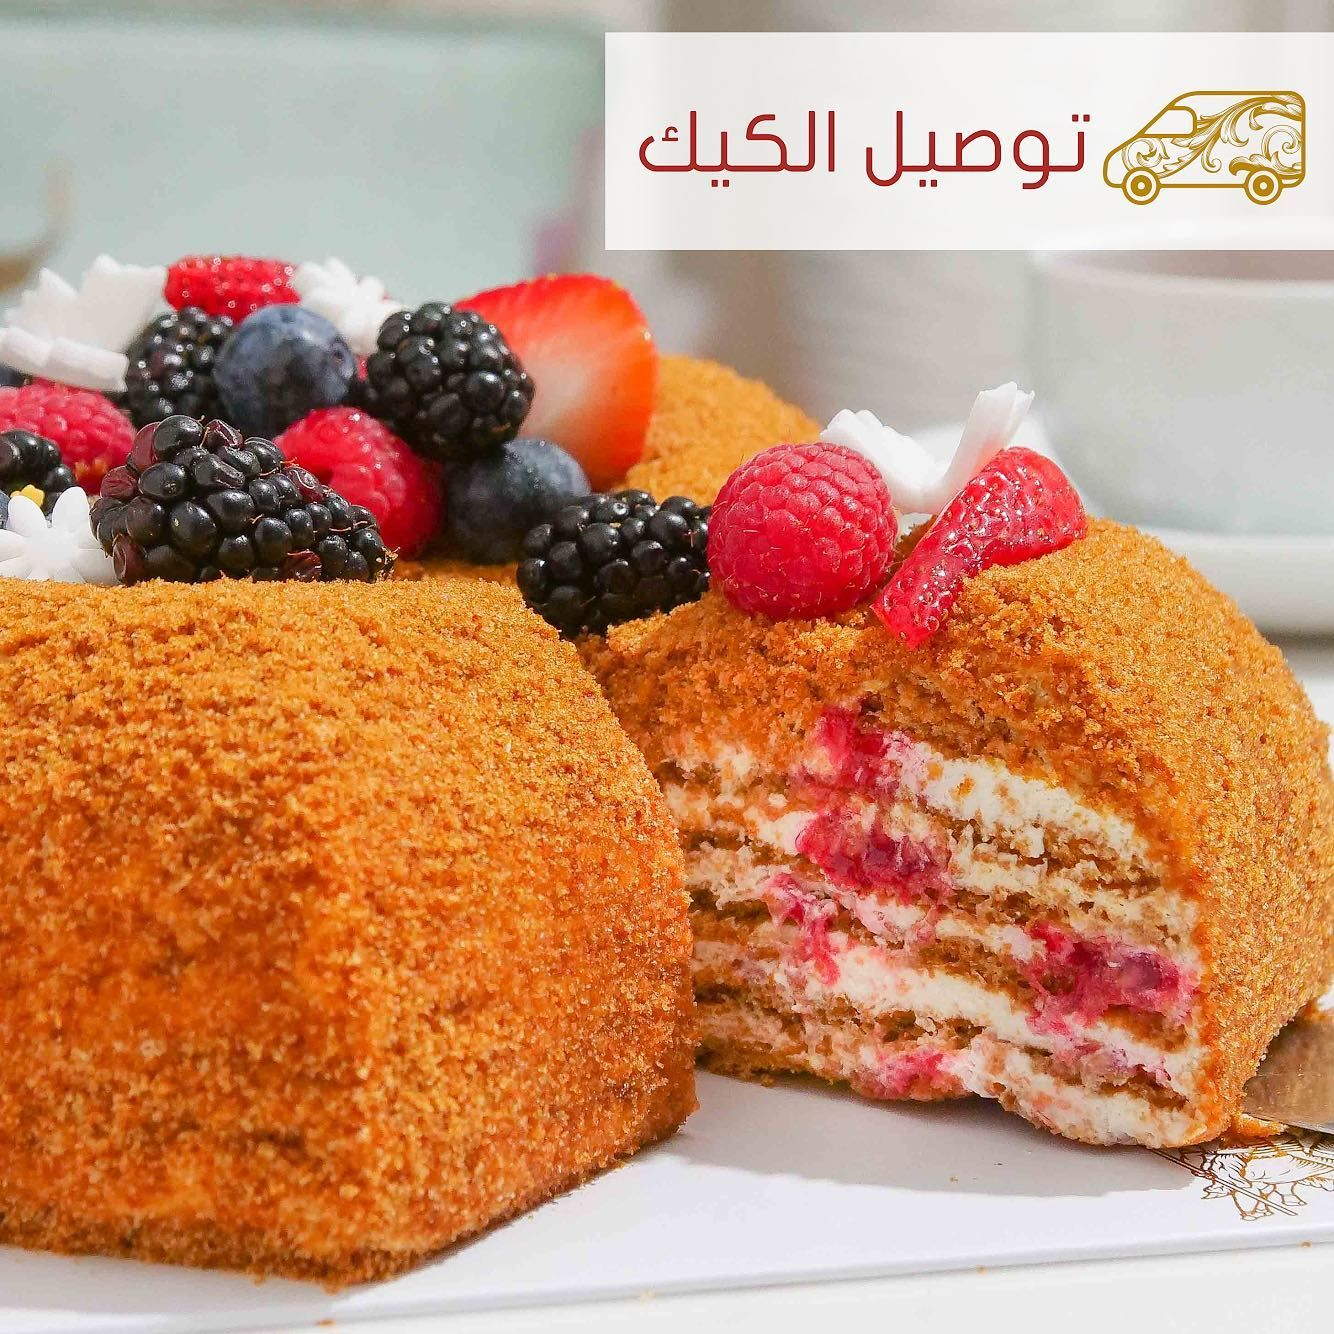 اهدها لمن تحب في العيد كيكة العسل بالتوت Gift It To Those You Love Raspberry Honey Cake Horatiilounge Breakfast Food Cake